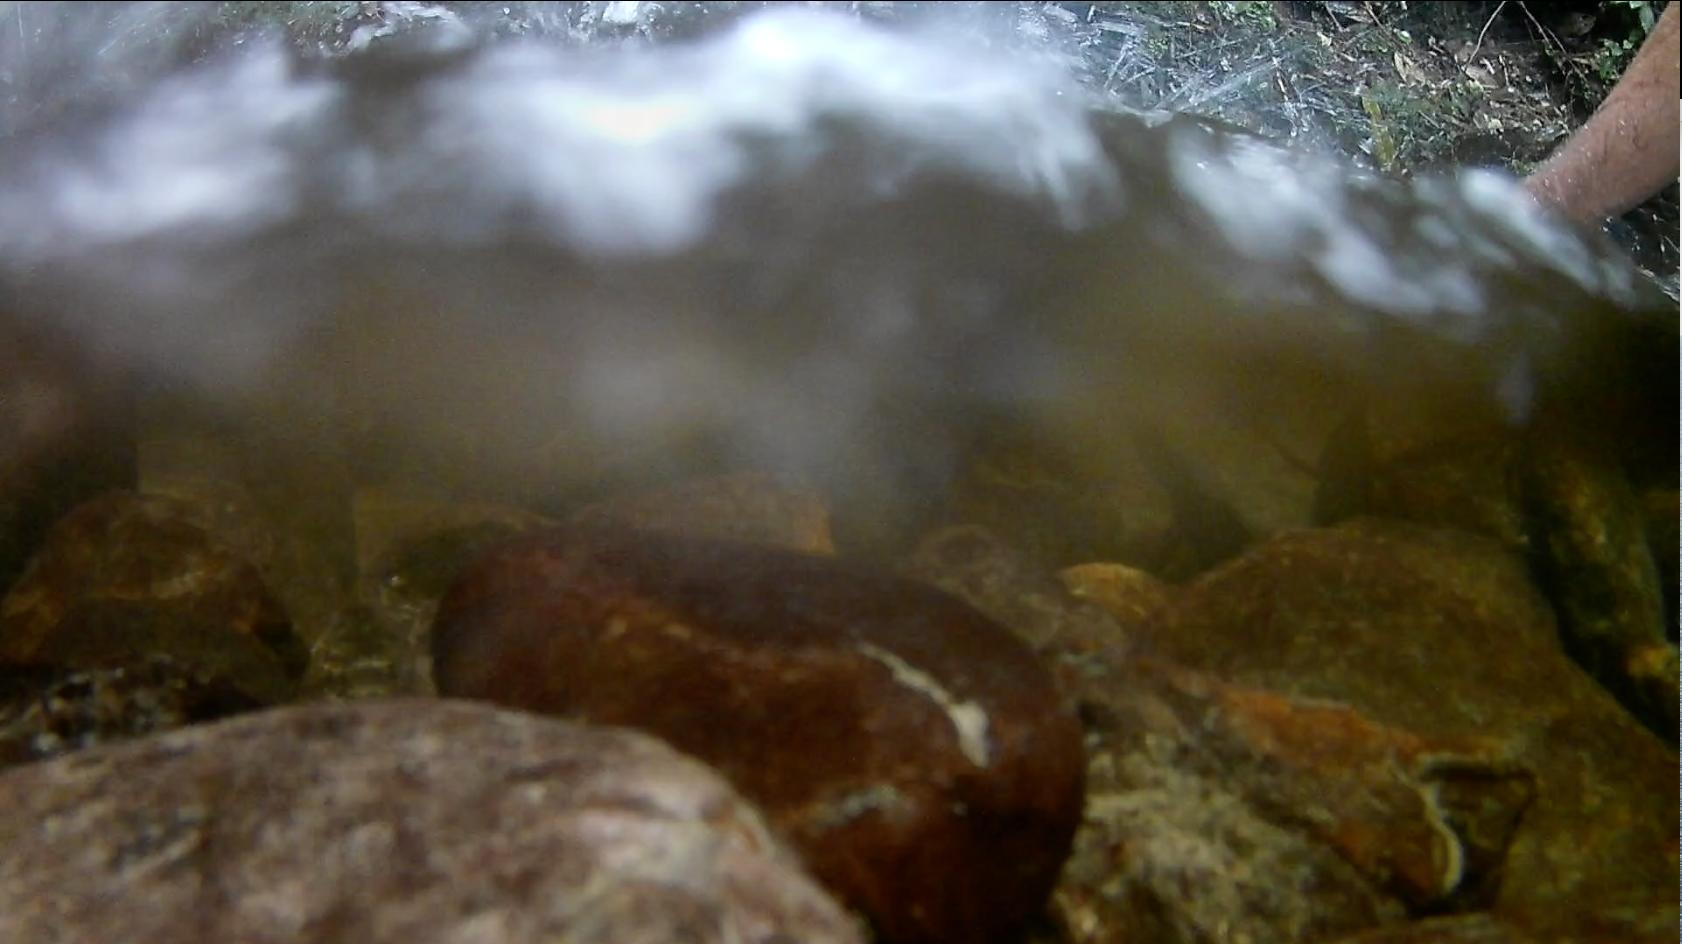 agua pura y transparente